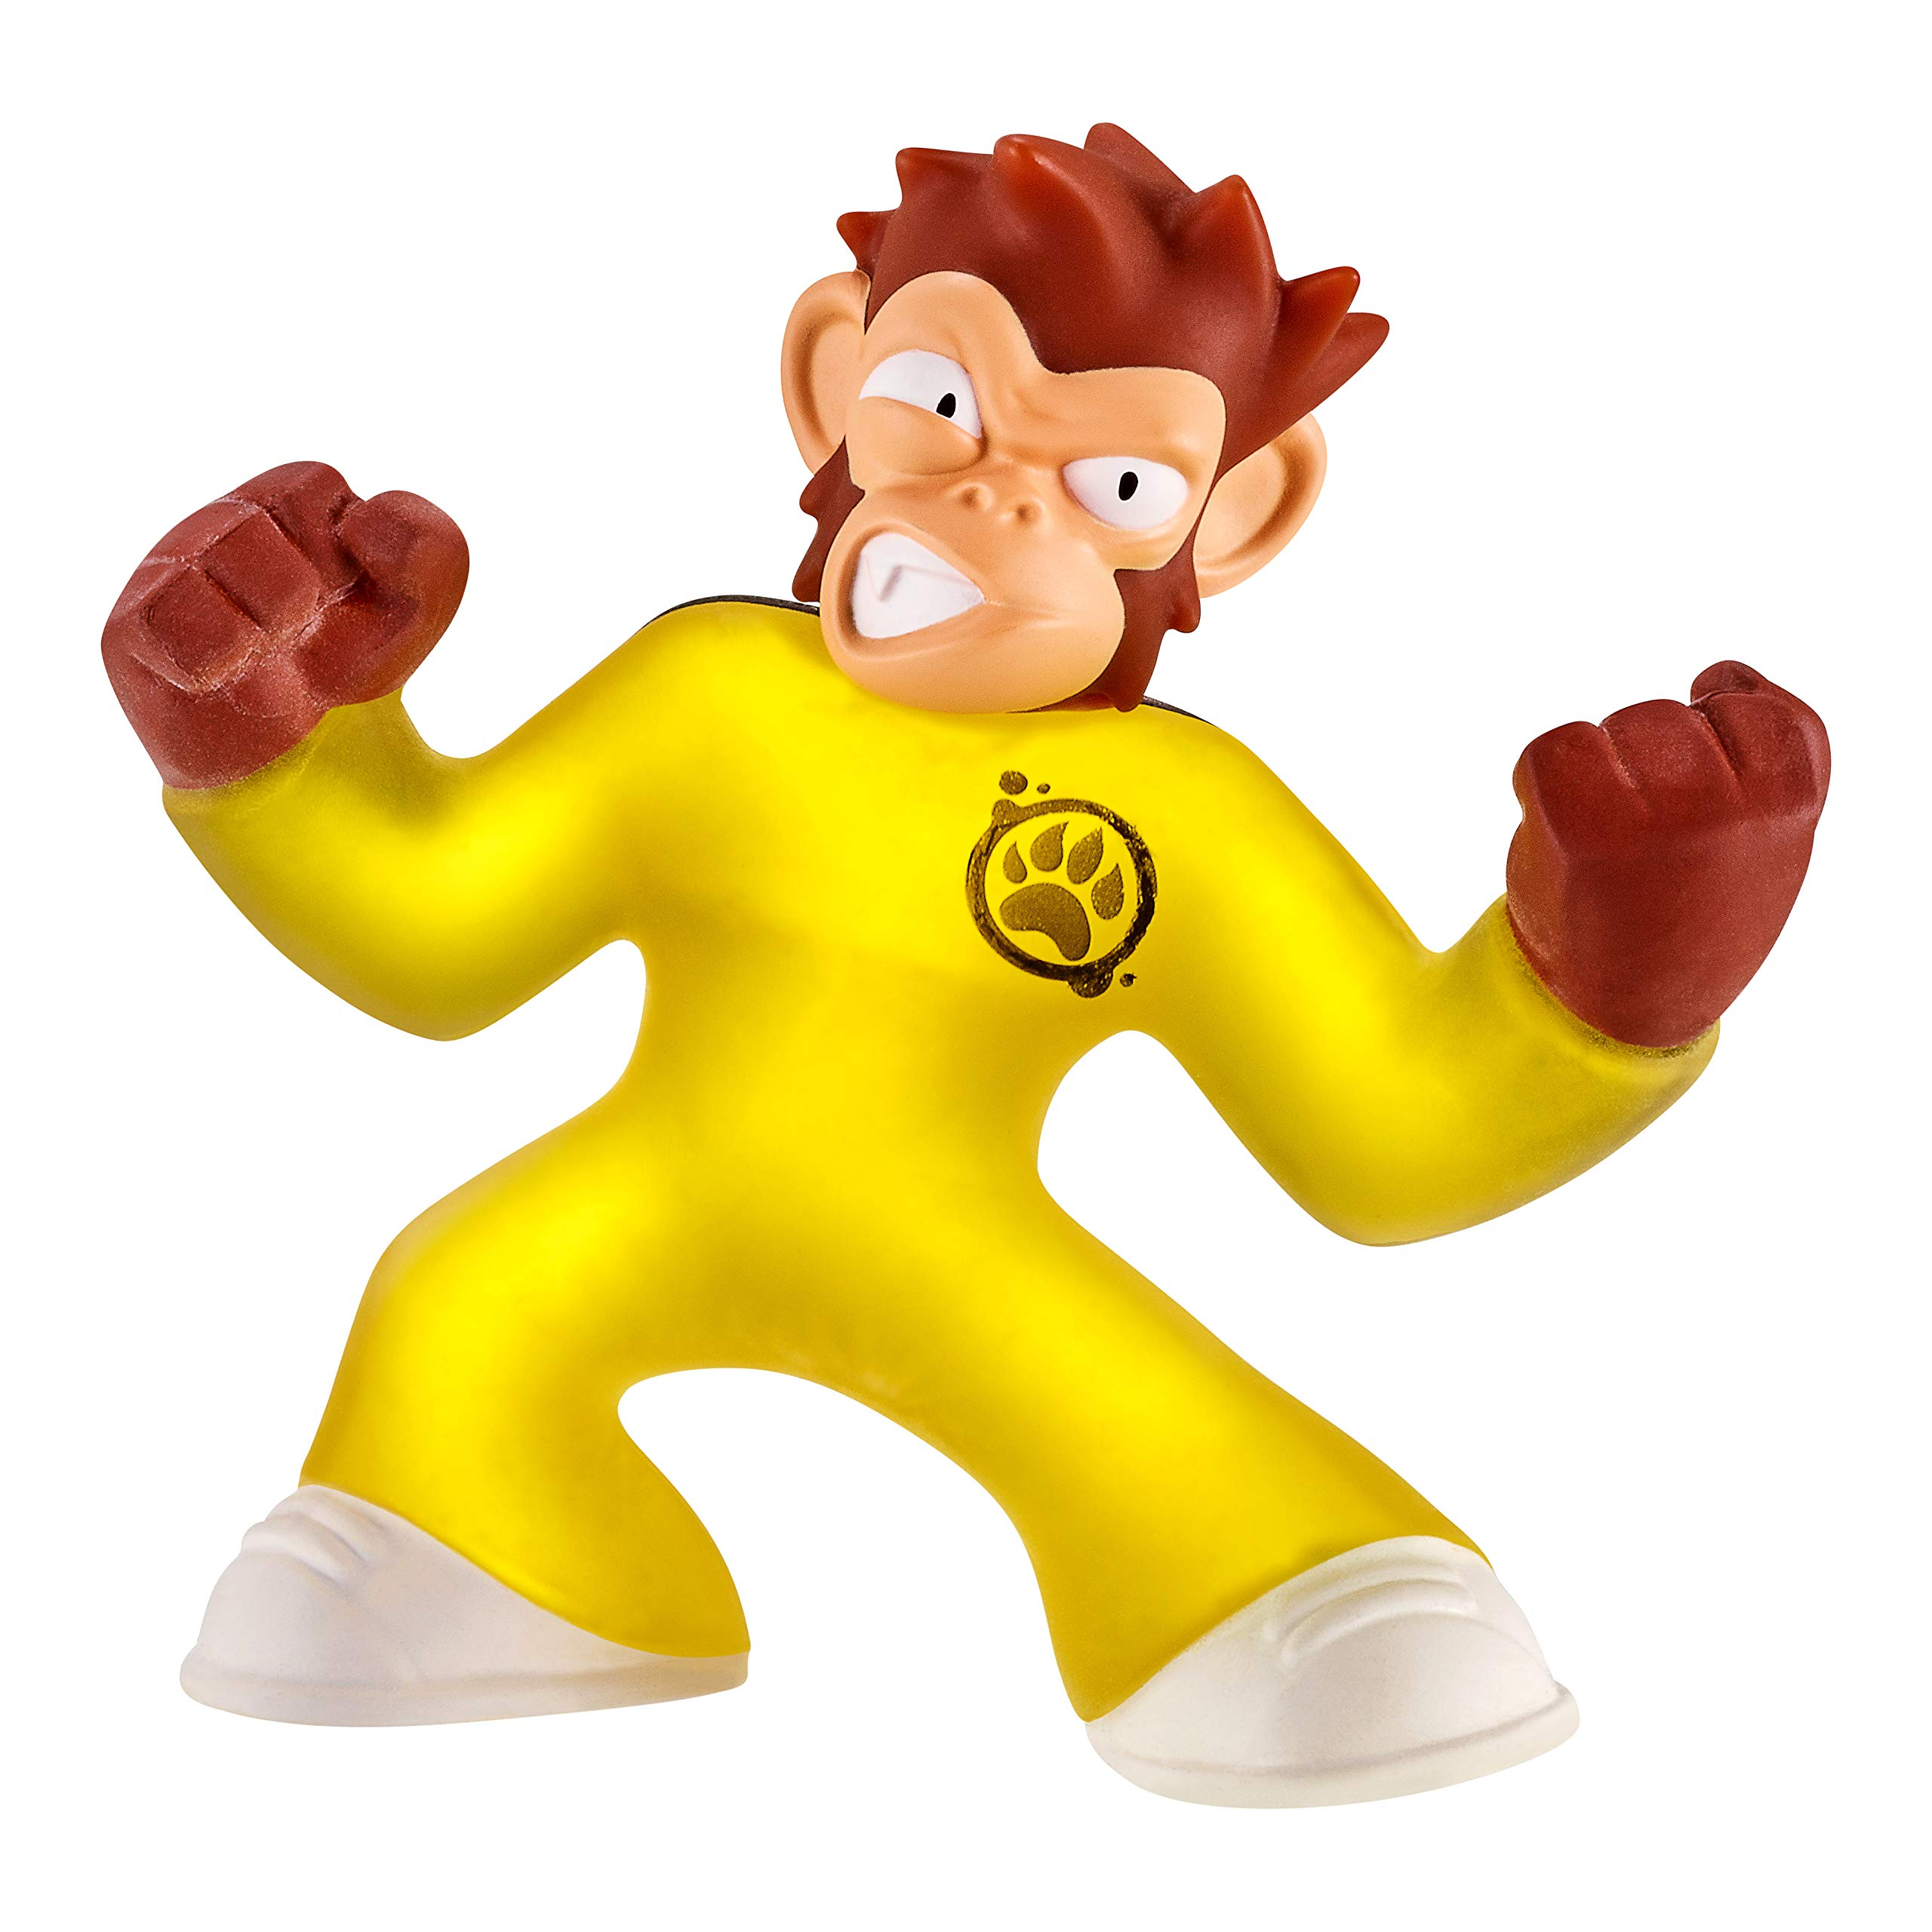 Heroes of Goo Jit Zu - Stretchy Monkey Action Figure, Simian by Heroes of Goo Jit Zu